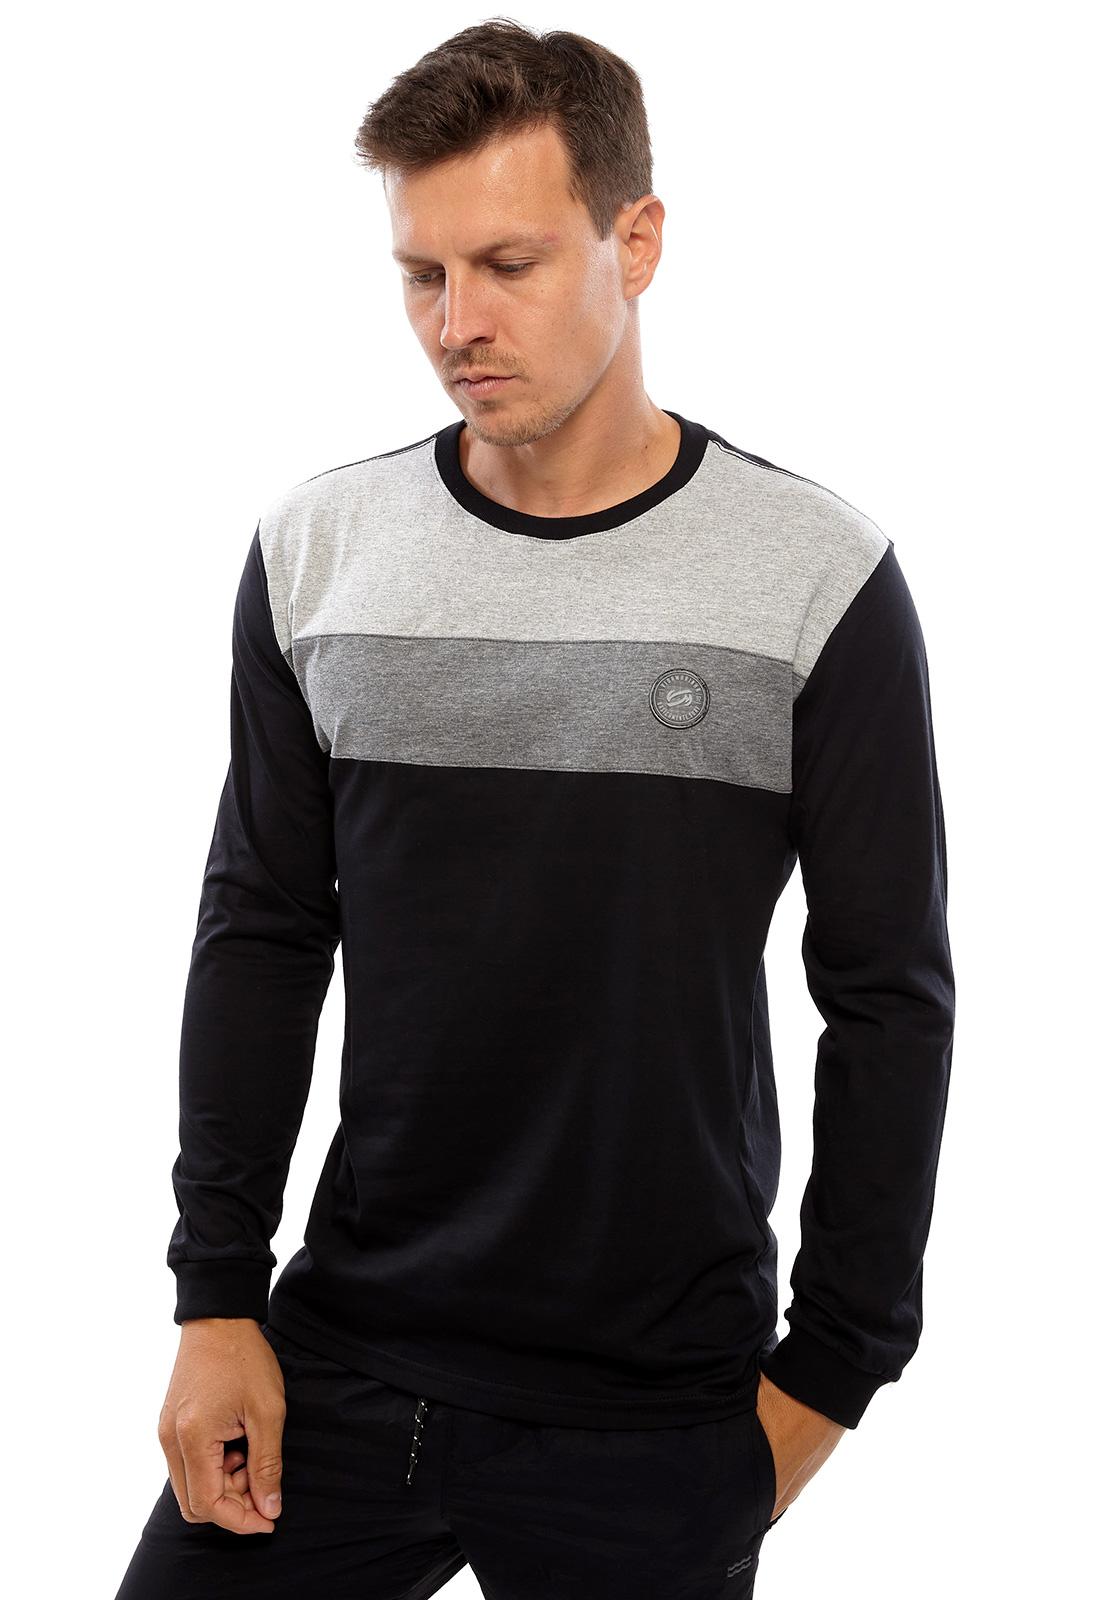 Camiseta Vida Marinha Manga Longa Preto/Cinza